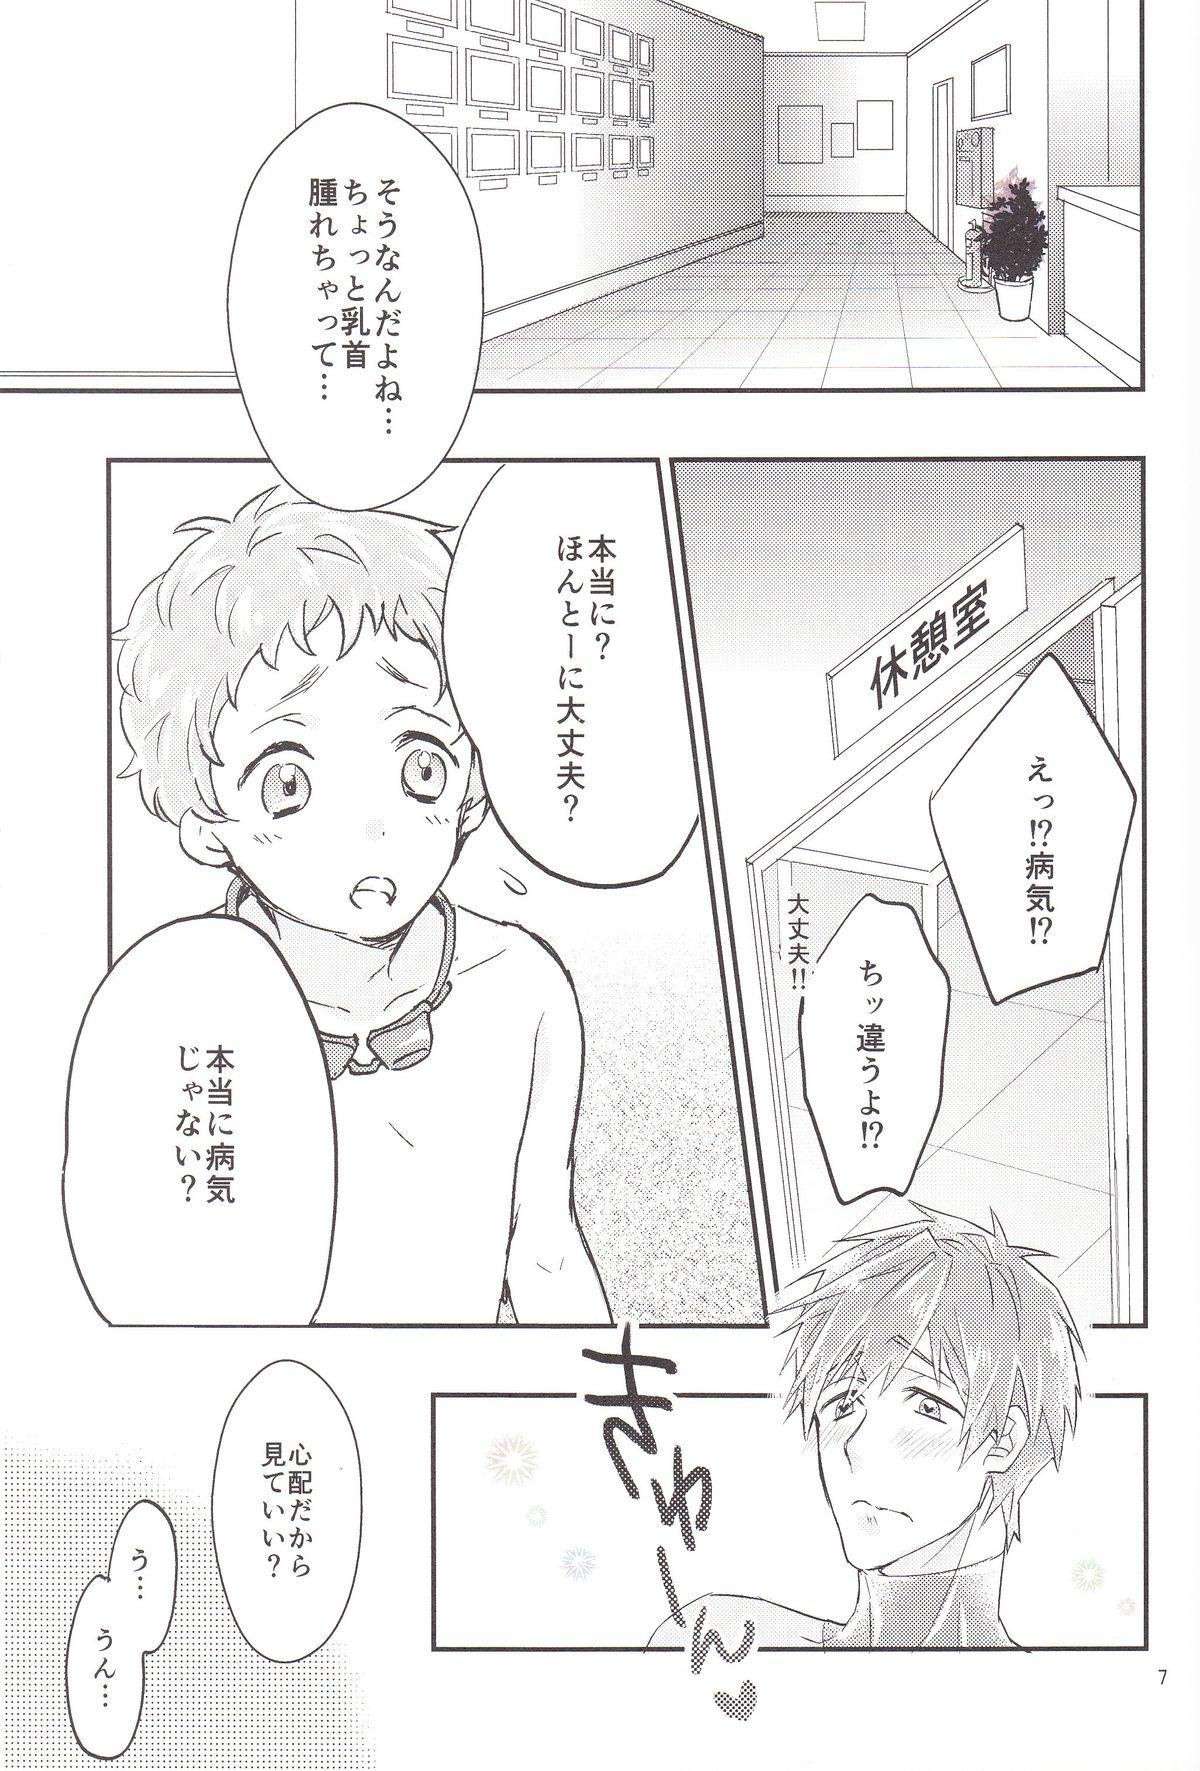 Tachibana Coach no Kojin Lesson 5